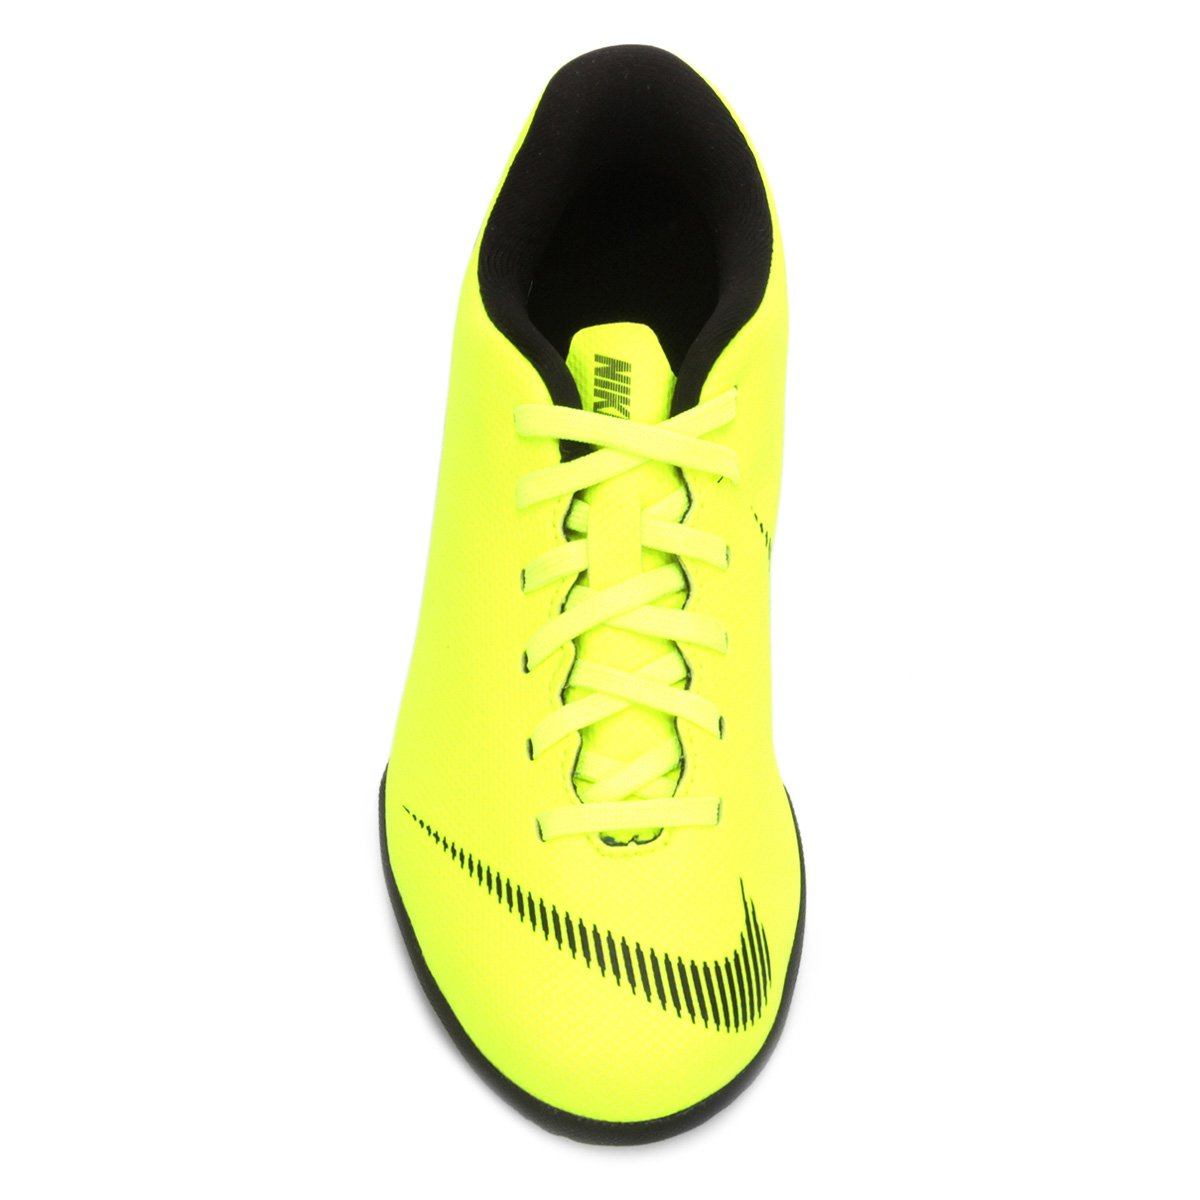 8f1d9b73e0 Chuteira Futsal Infantil Nike Mercurial Vapor 12 Club - Verde e ...